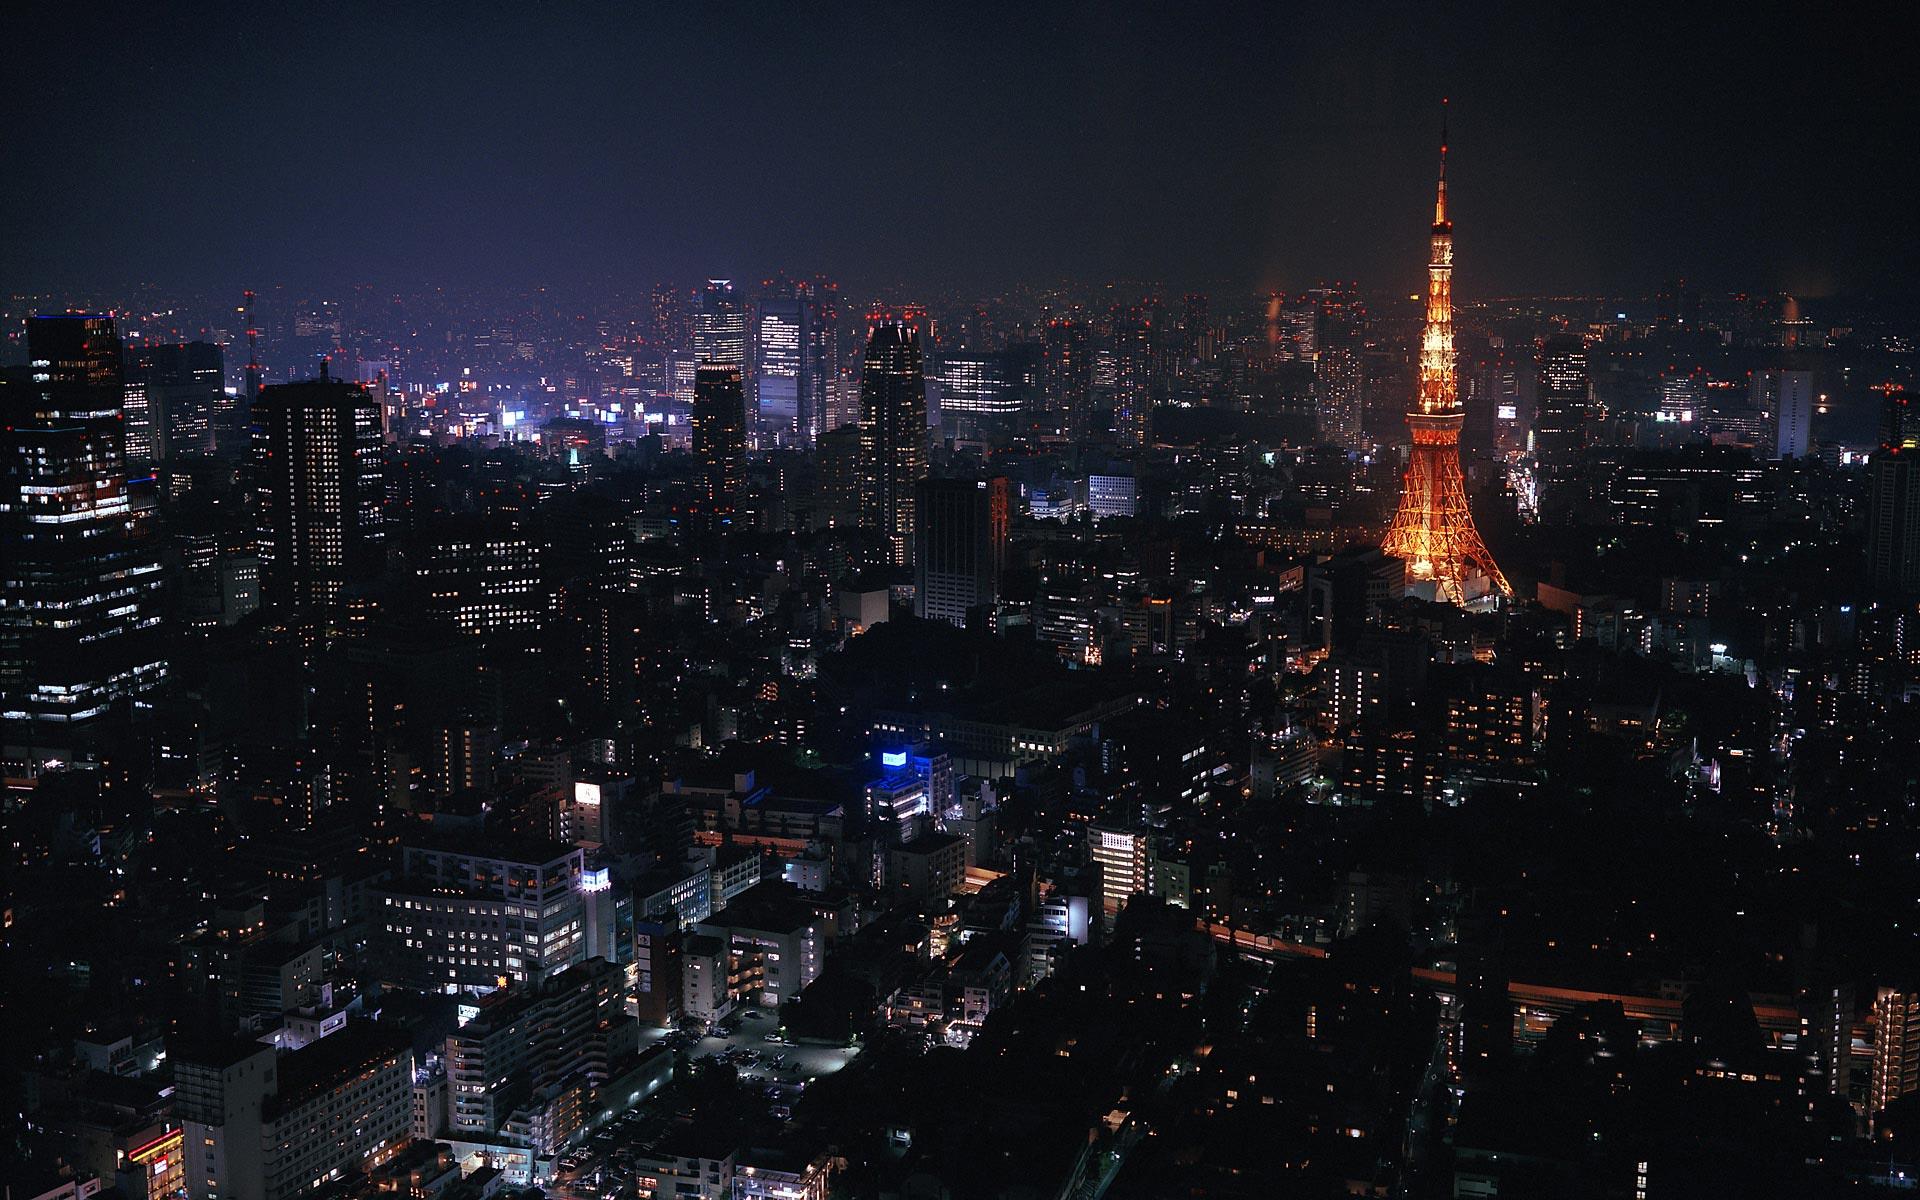 1920x1200 Tokyo at night desktop PC and Mac wallpaper 1920x1200